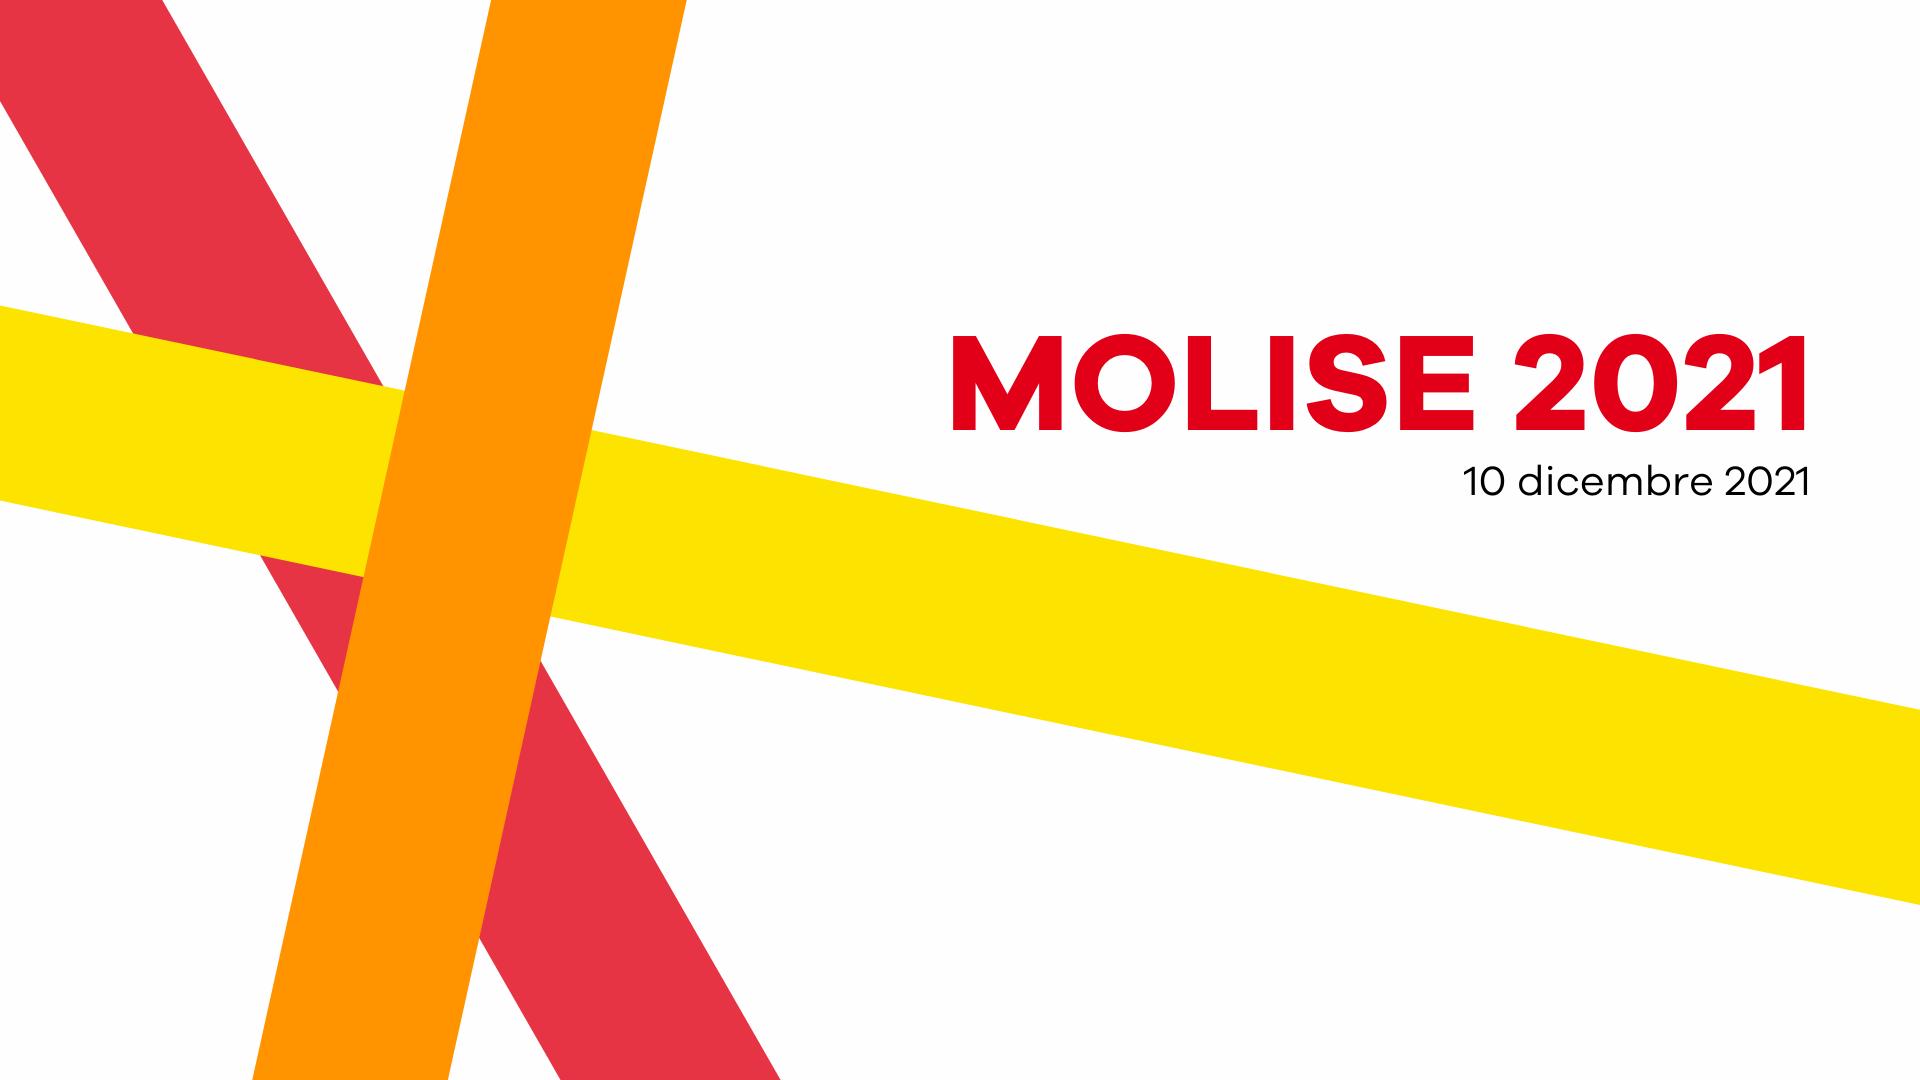 Molise 2021 Online